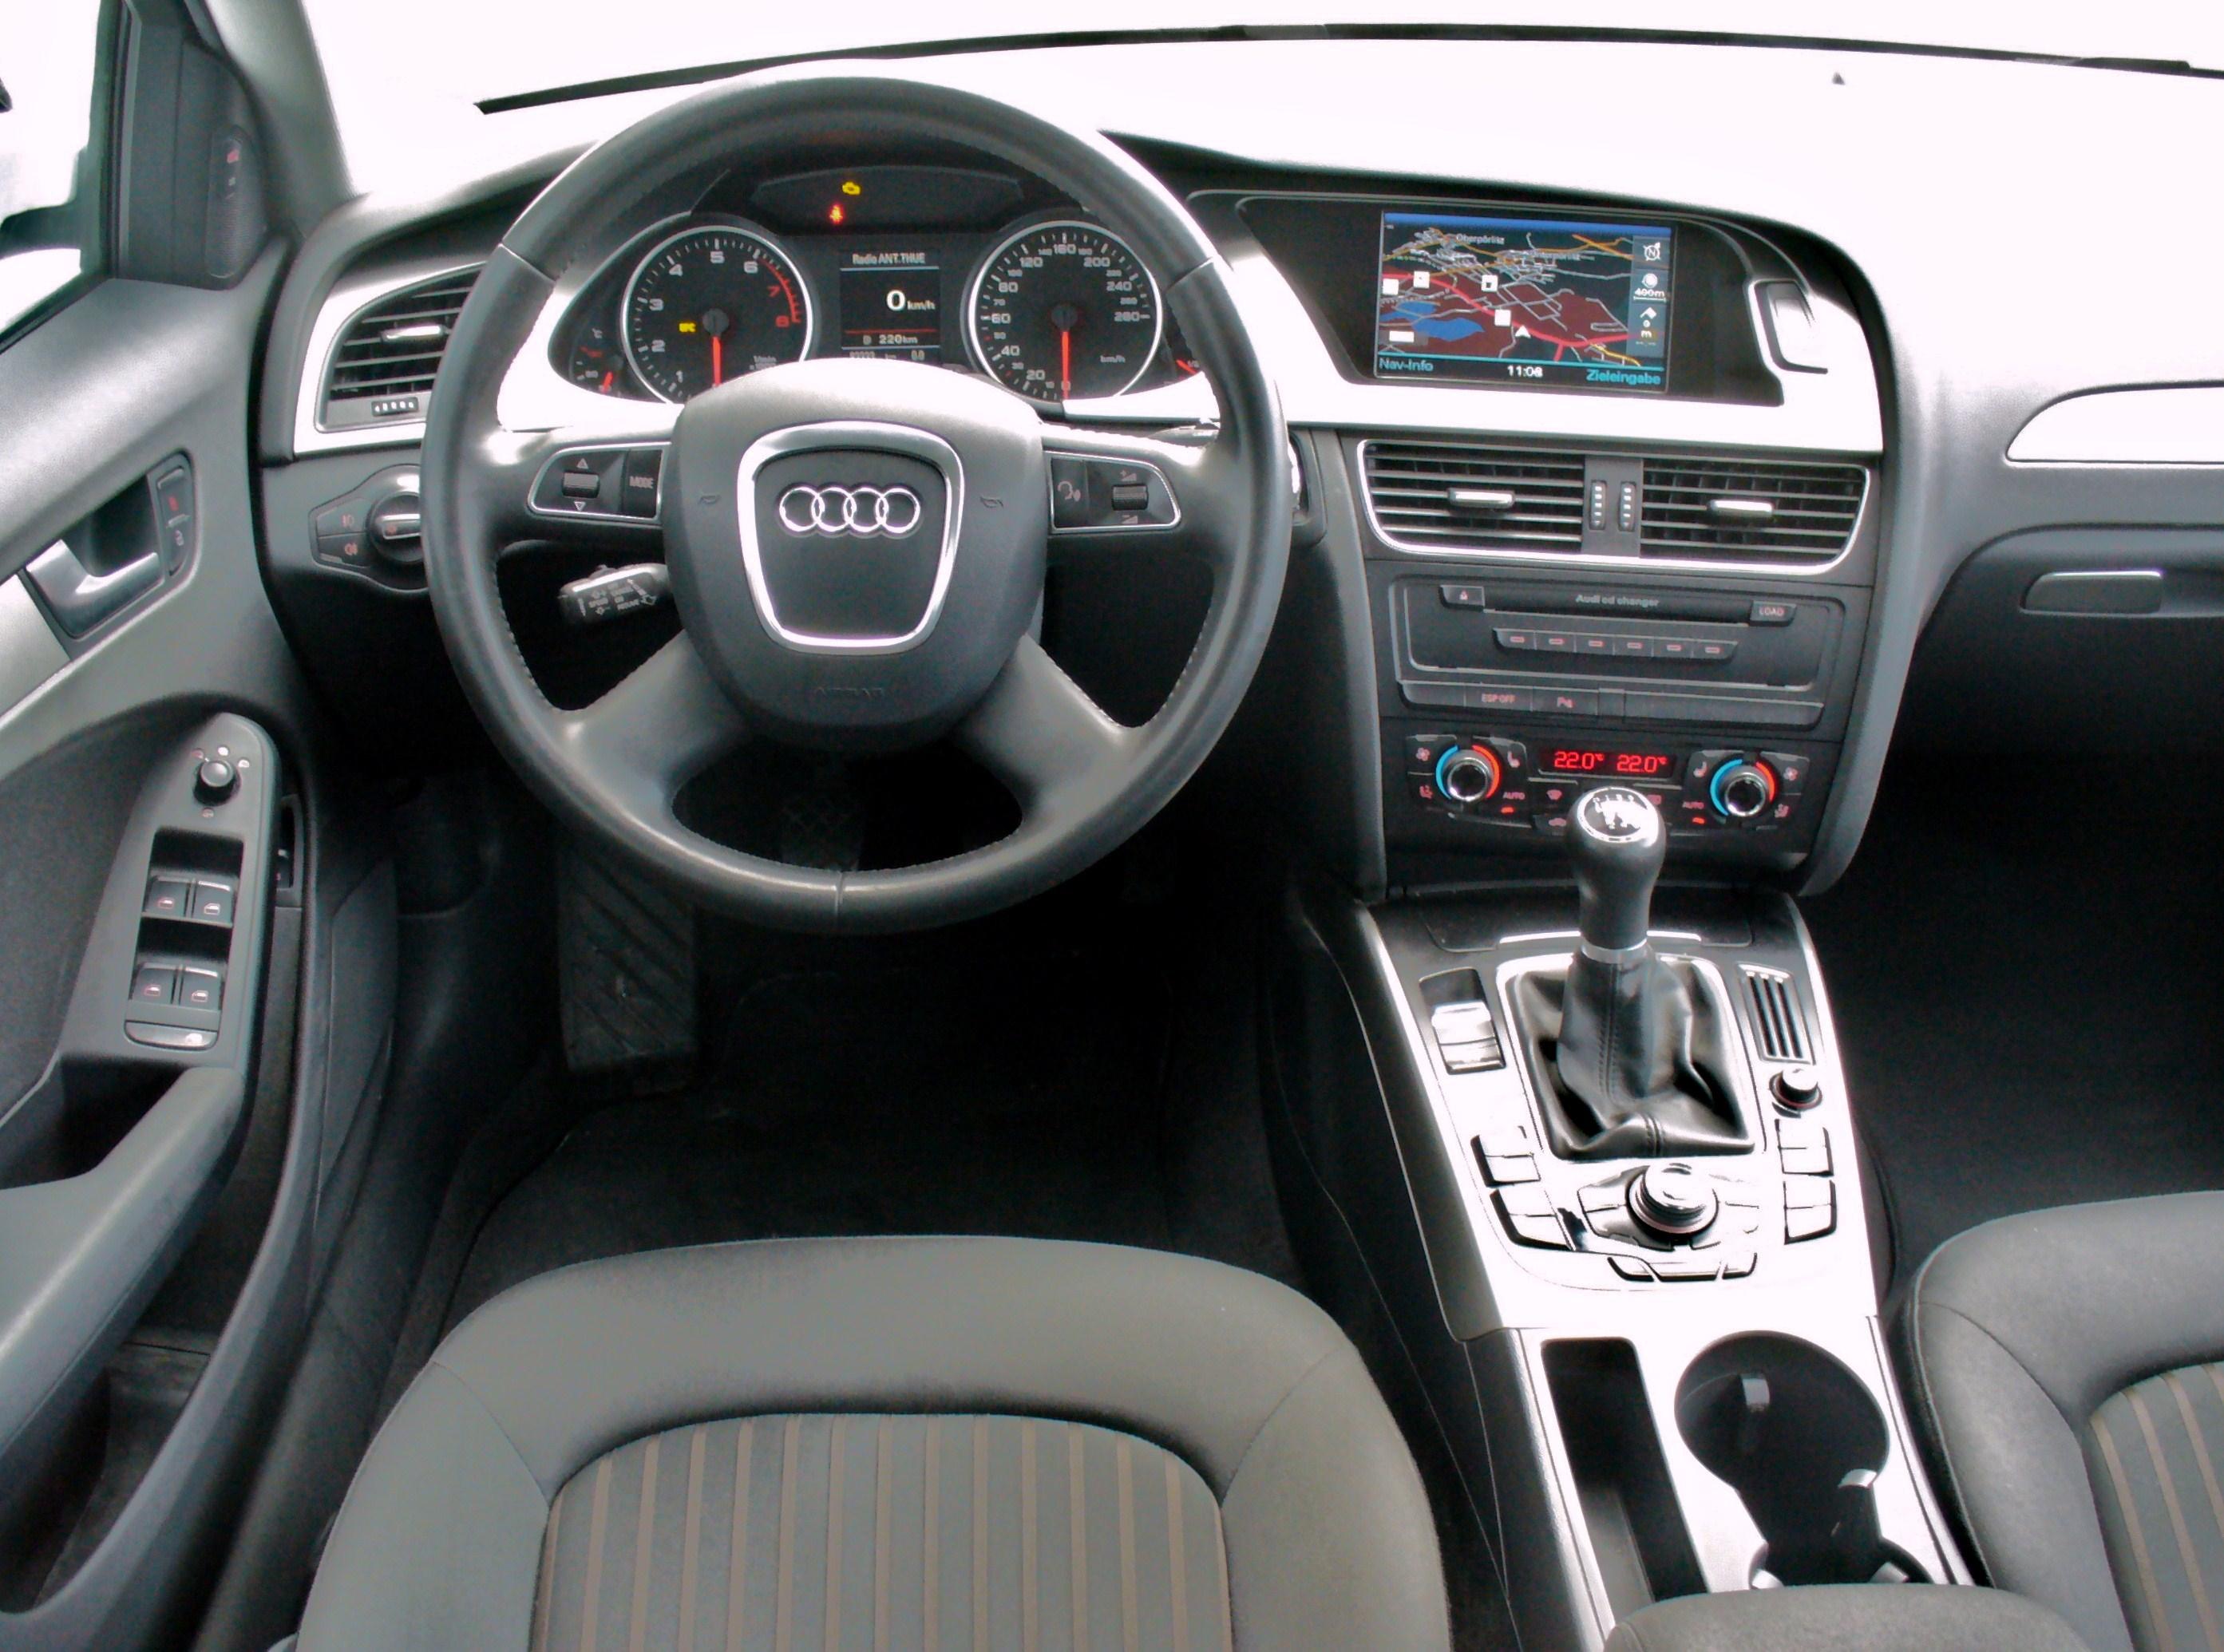 Audi a4 ambiente voiture galerie for Audi a4 interieur